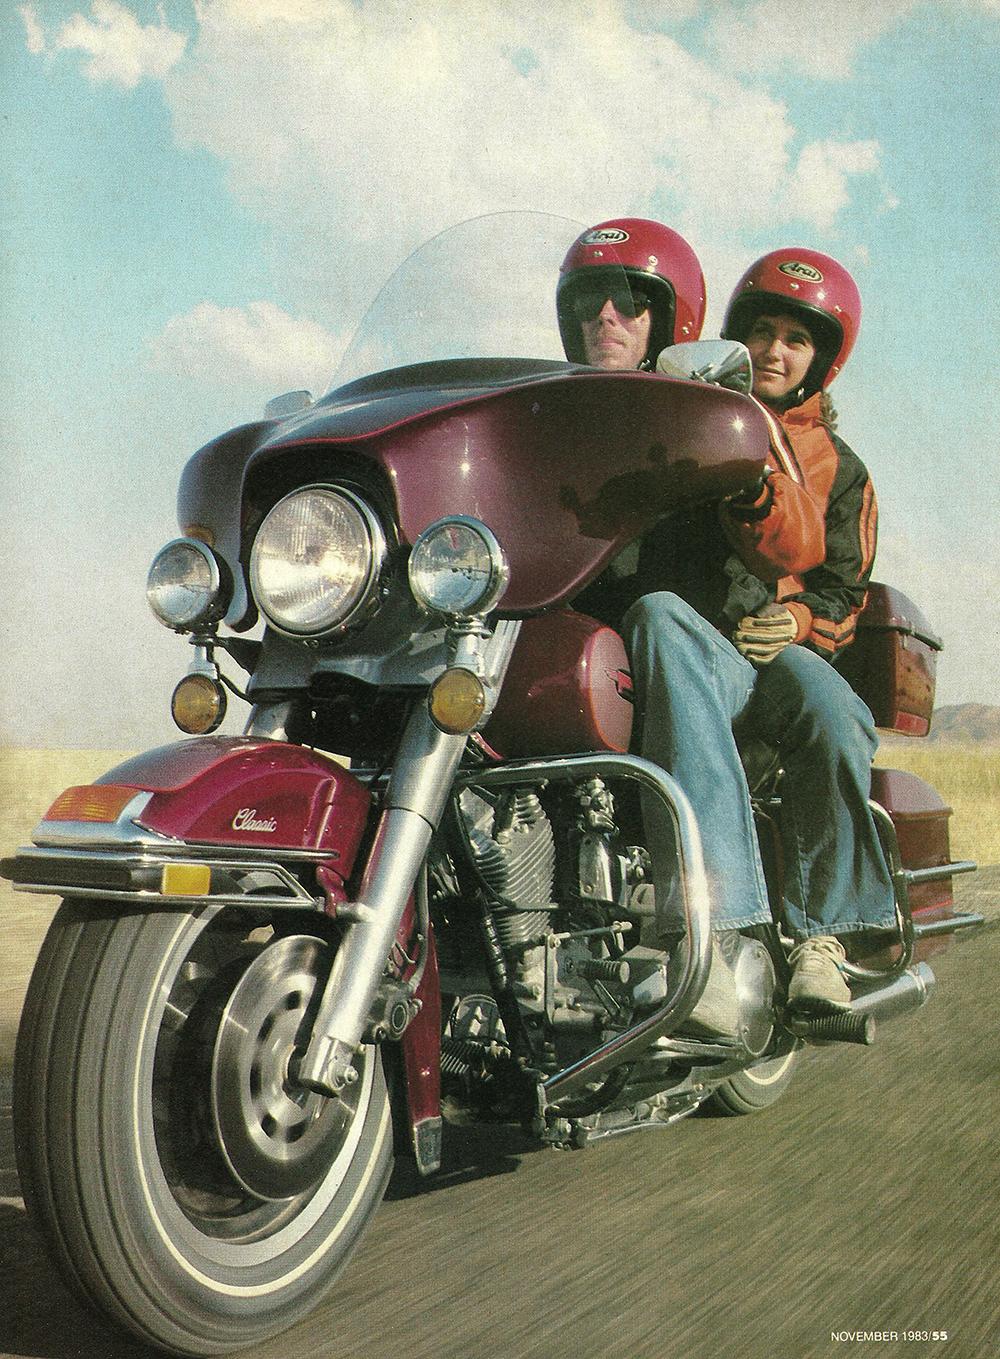 1983 Harley-Davidson FLHTC road test 02.jpg